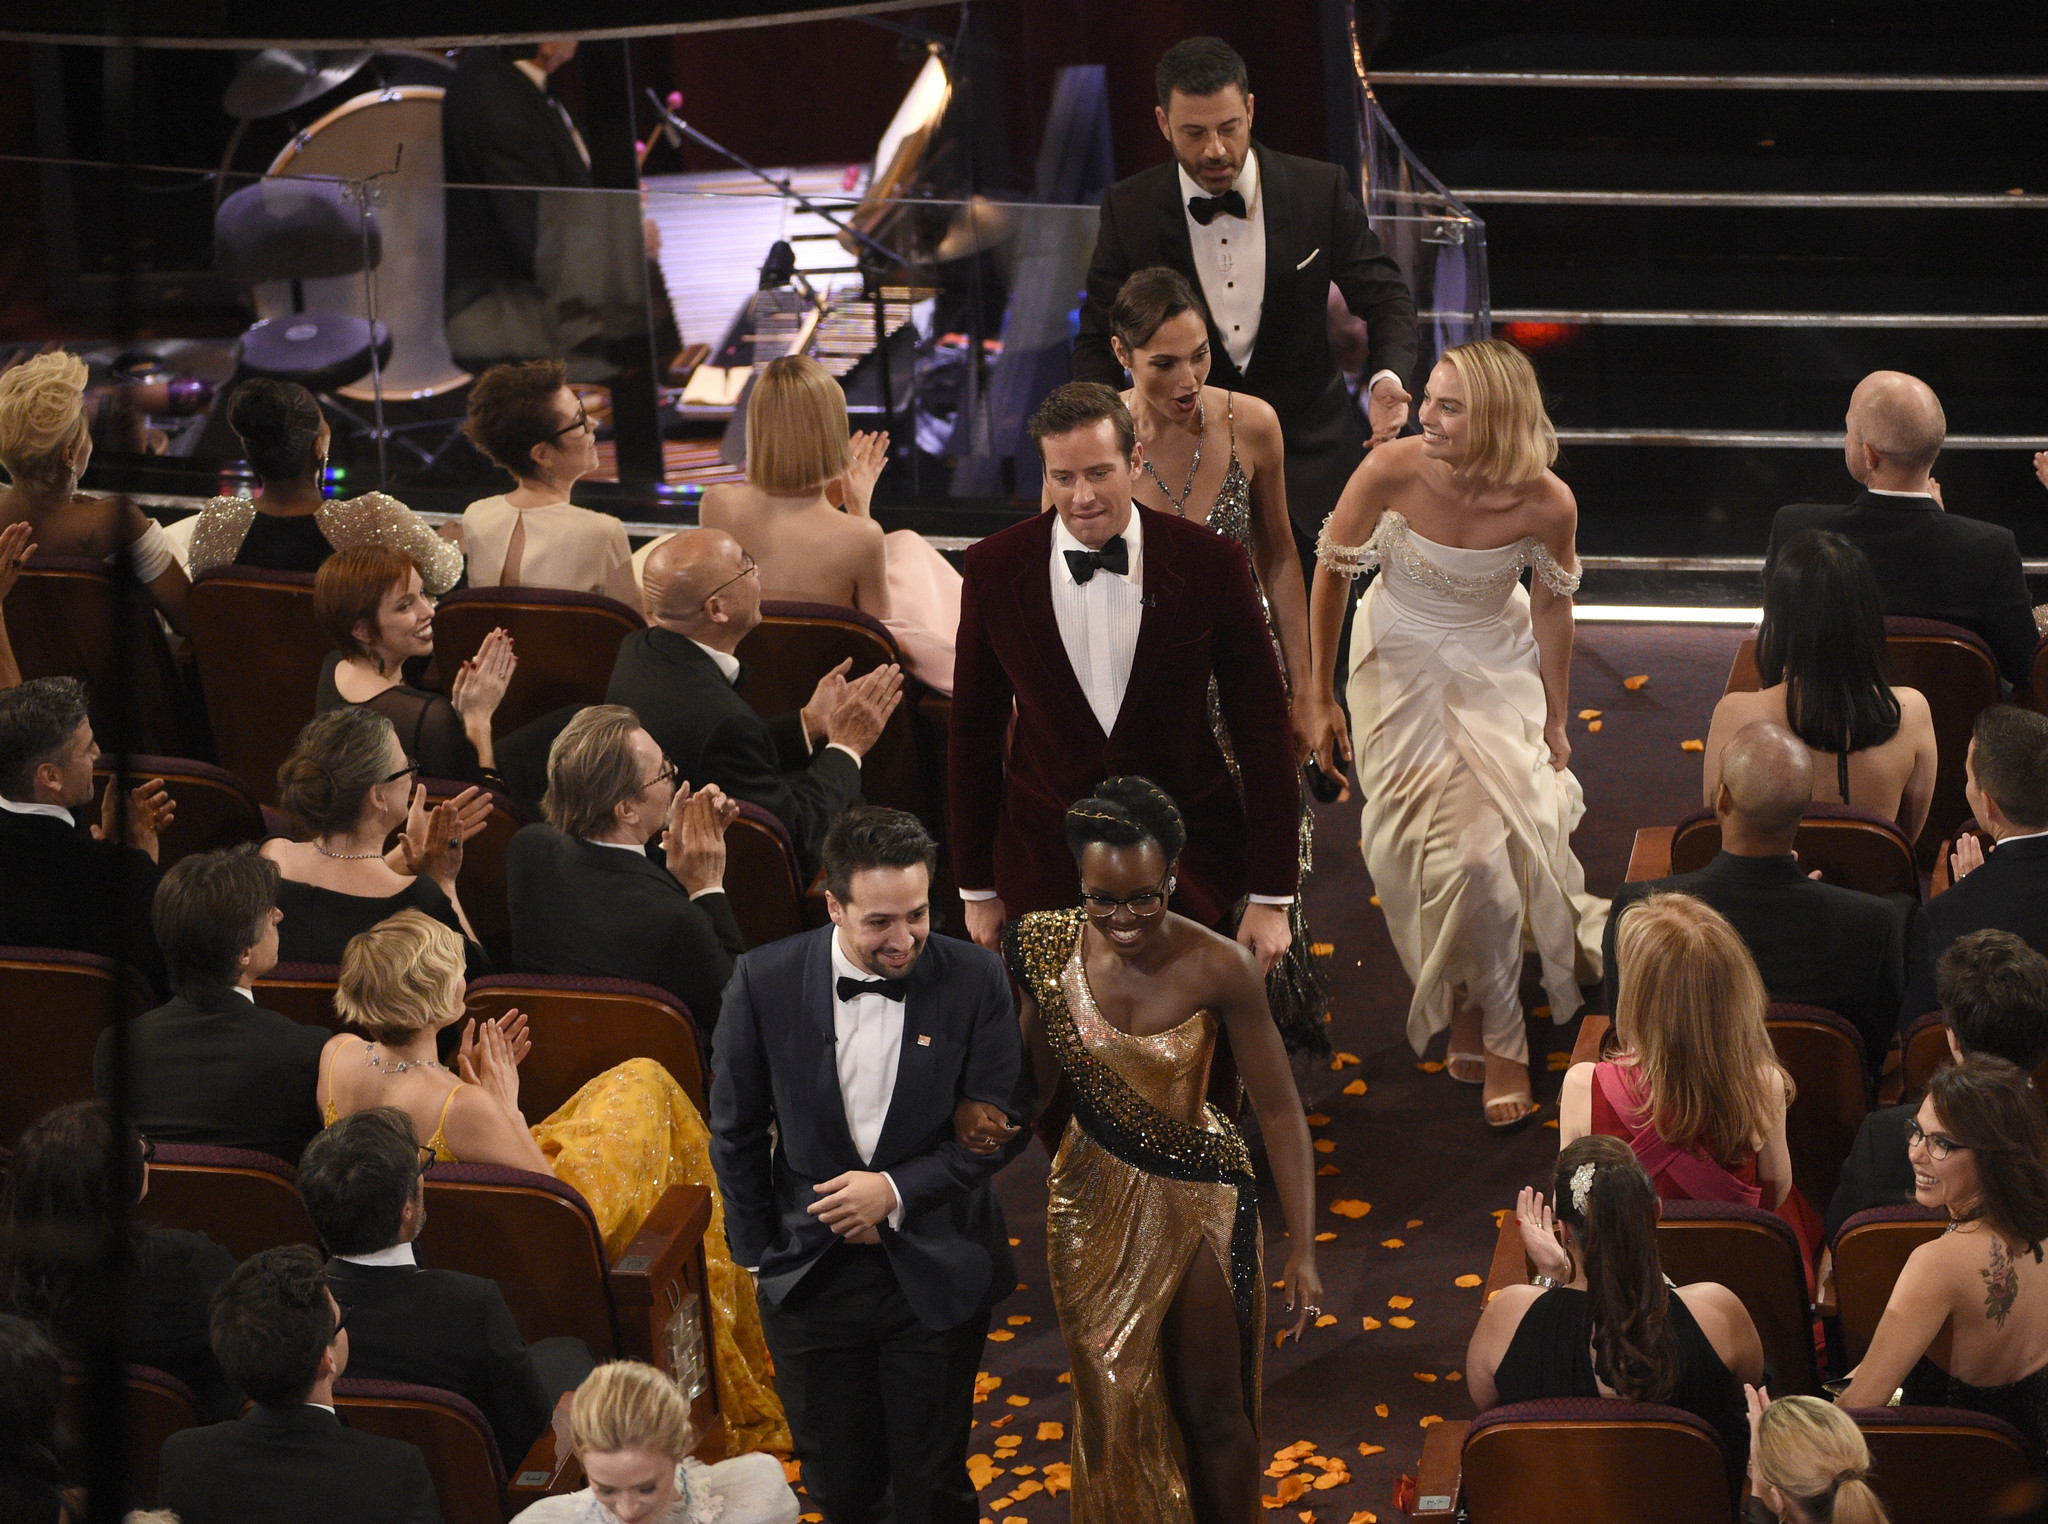 to greetLin-Manuel Miranda, Lupita Nyong'o, Armie Hammer, Gal Gadot, Jimmy Kimmel, Margot Robb